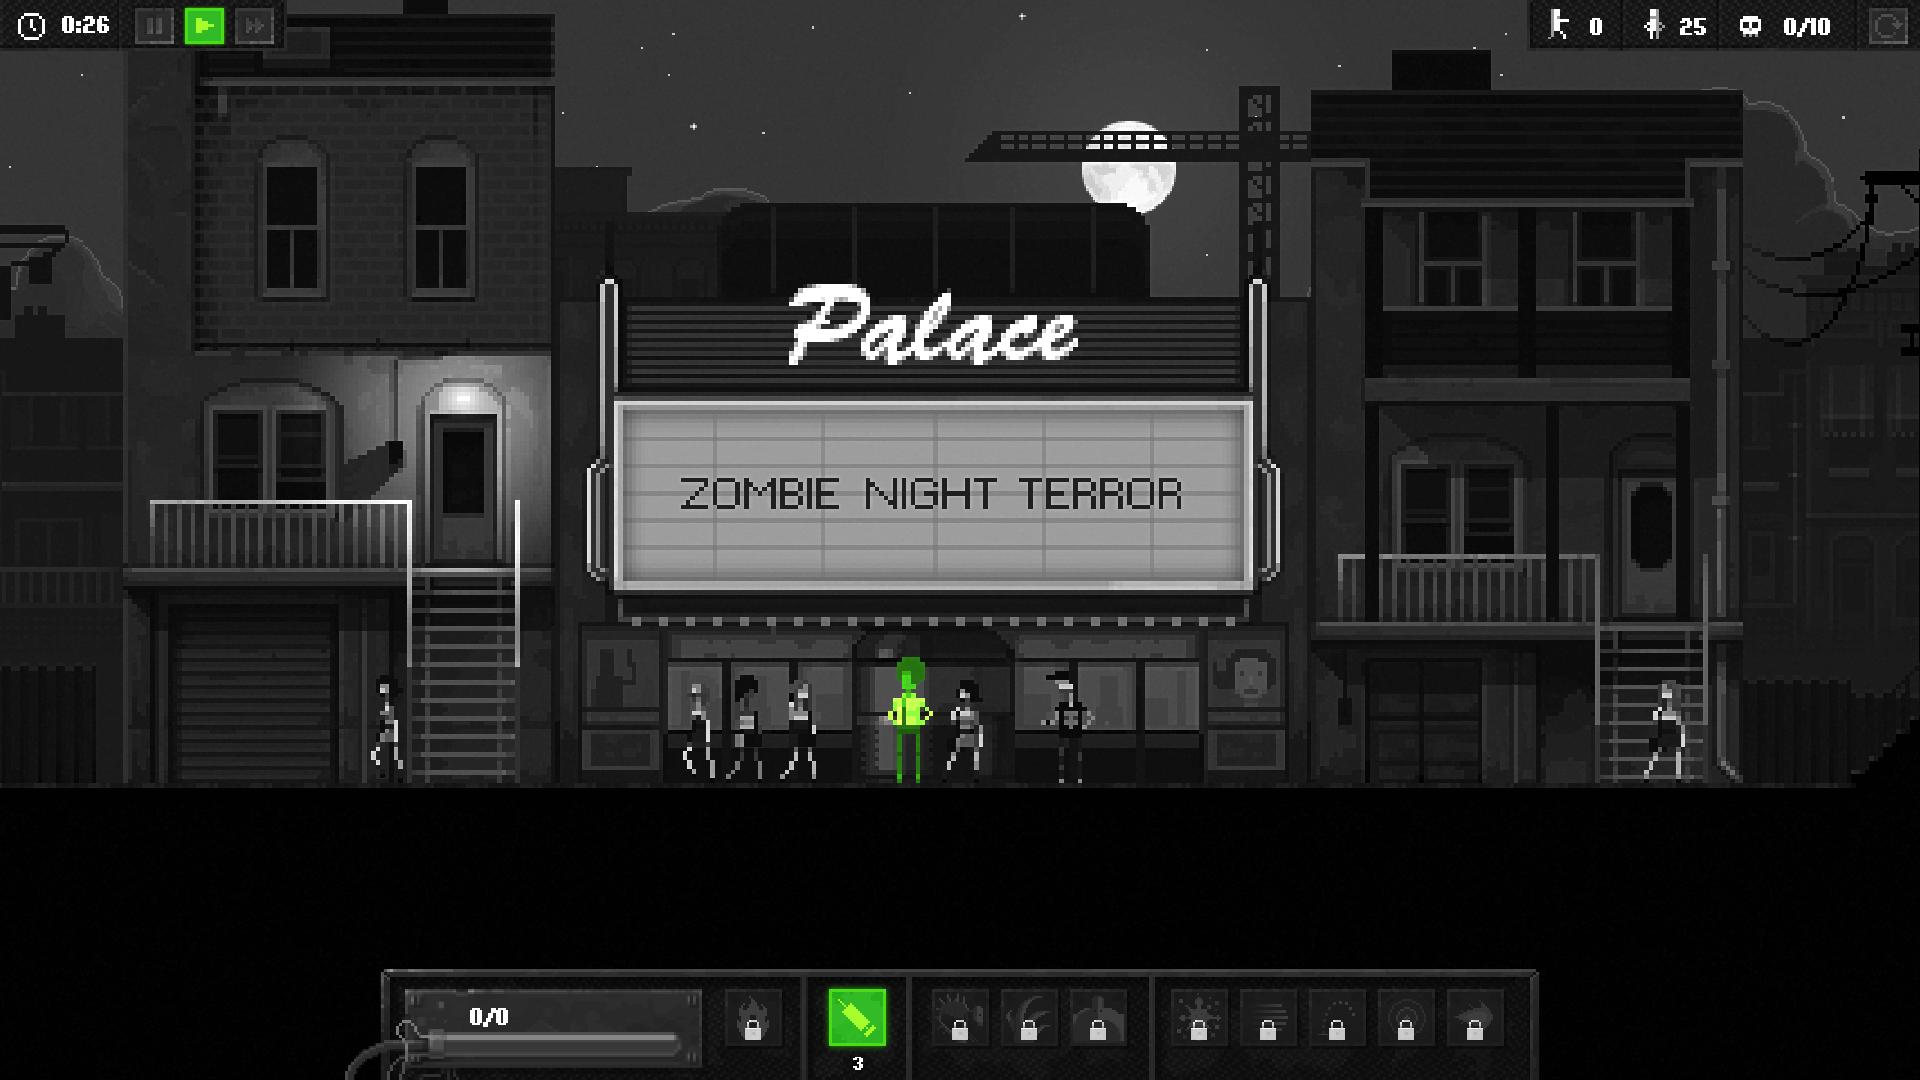 Zombie Night Terror (Bildrechte: Gambitious Digital Entertainment)